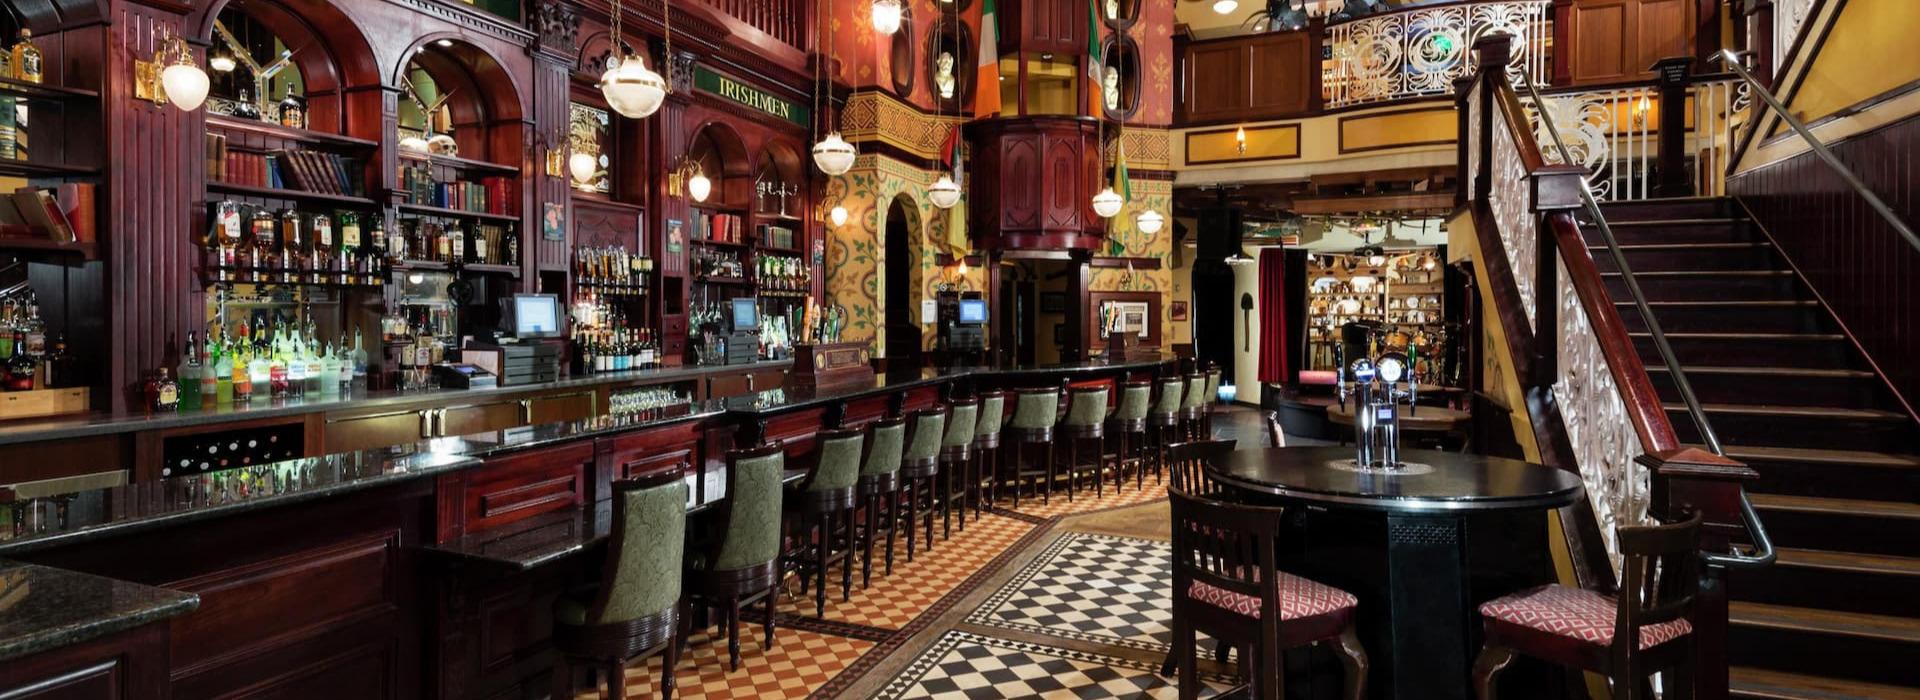 Abbey Players Pub